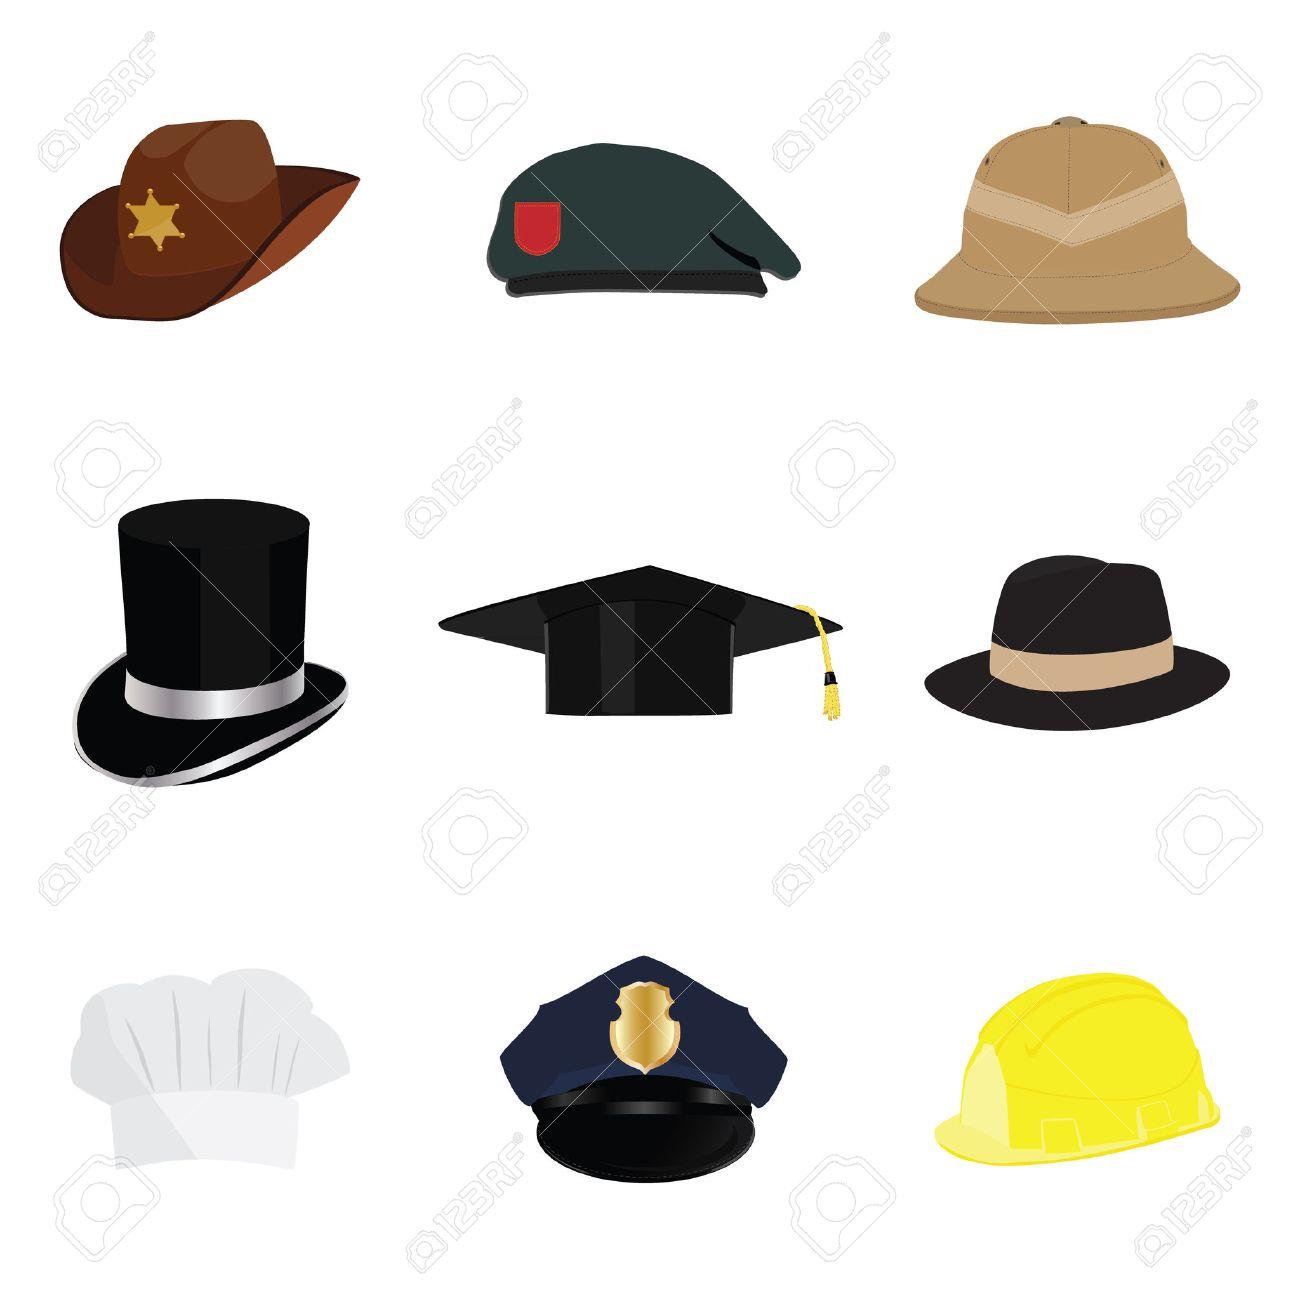 Hats and helmets collection, with policeman hat, sheriff hat, cowboy hat, work hat, top hat, graduation hat, fedora hat, safari hat, chef hat. Vector illustration cartoon. - 45910520